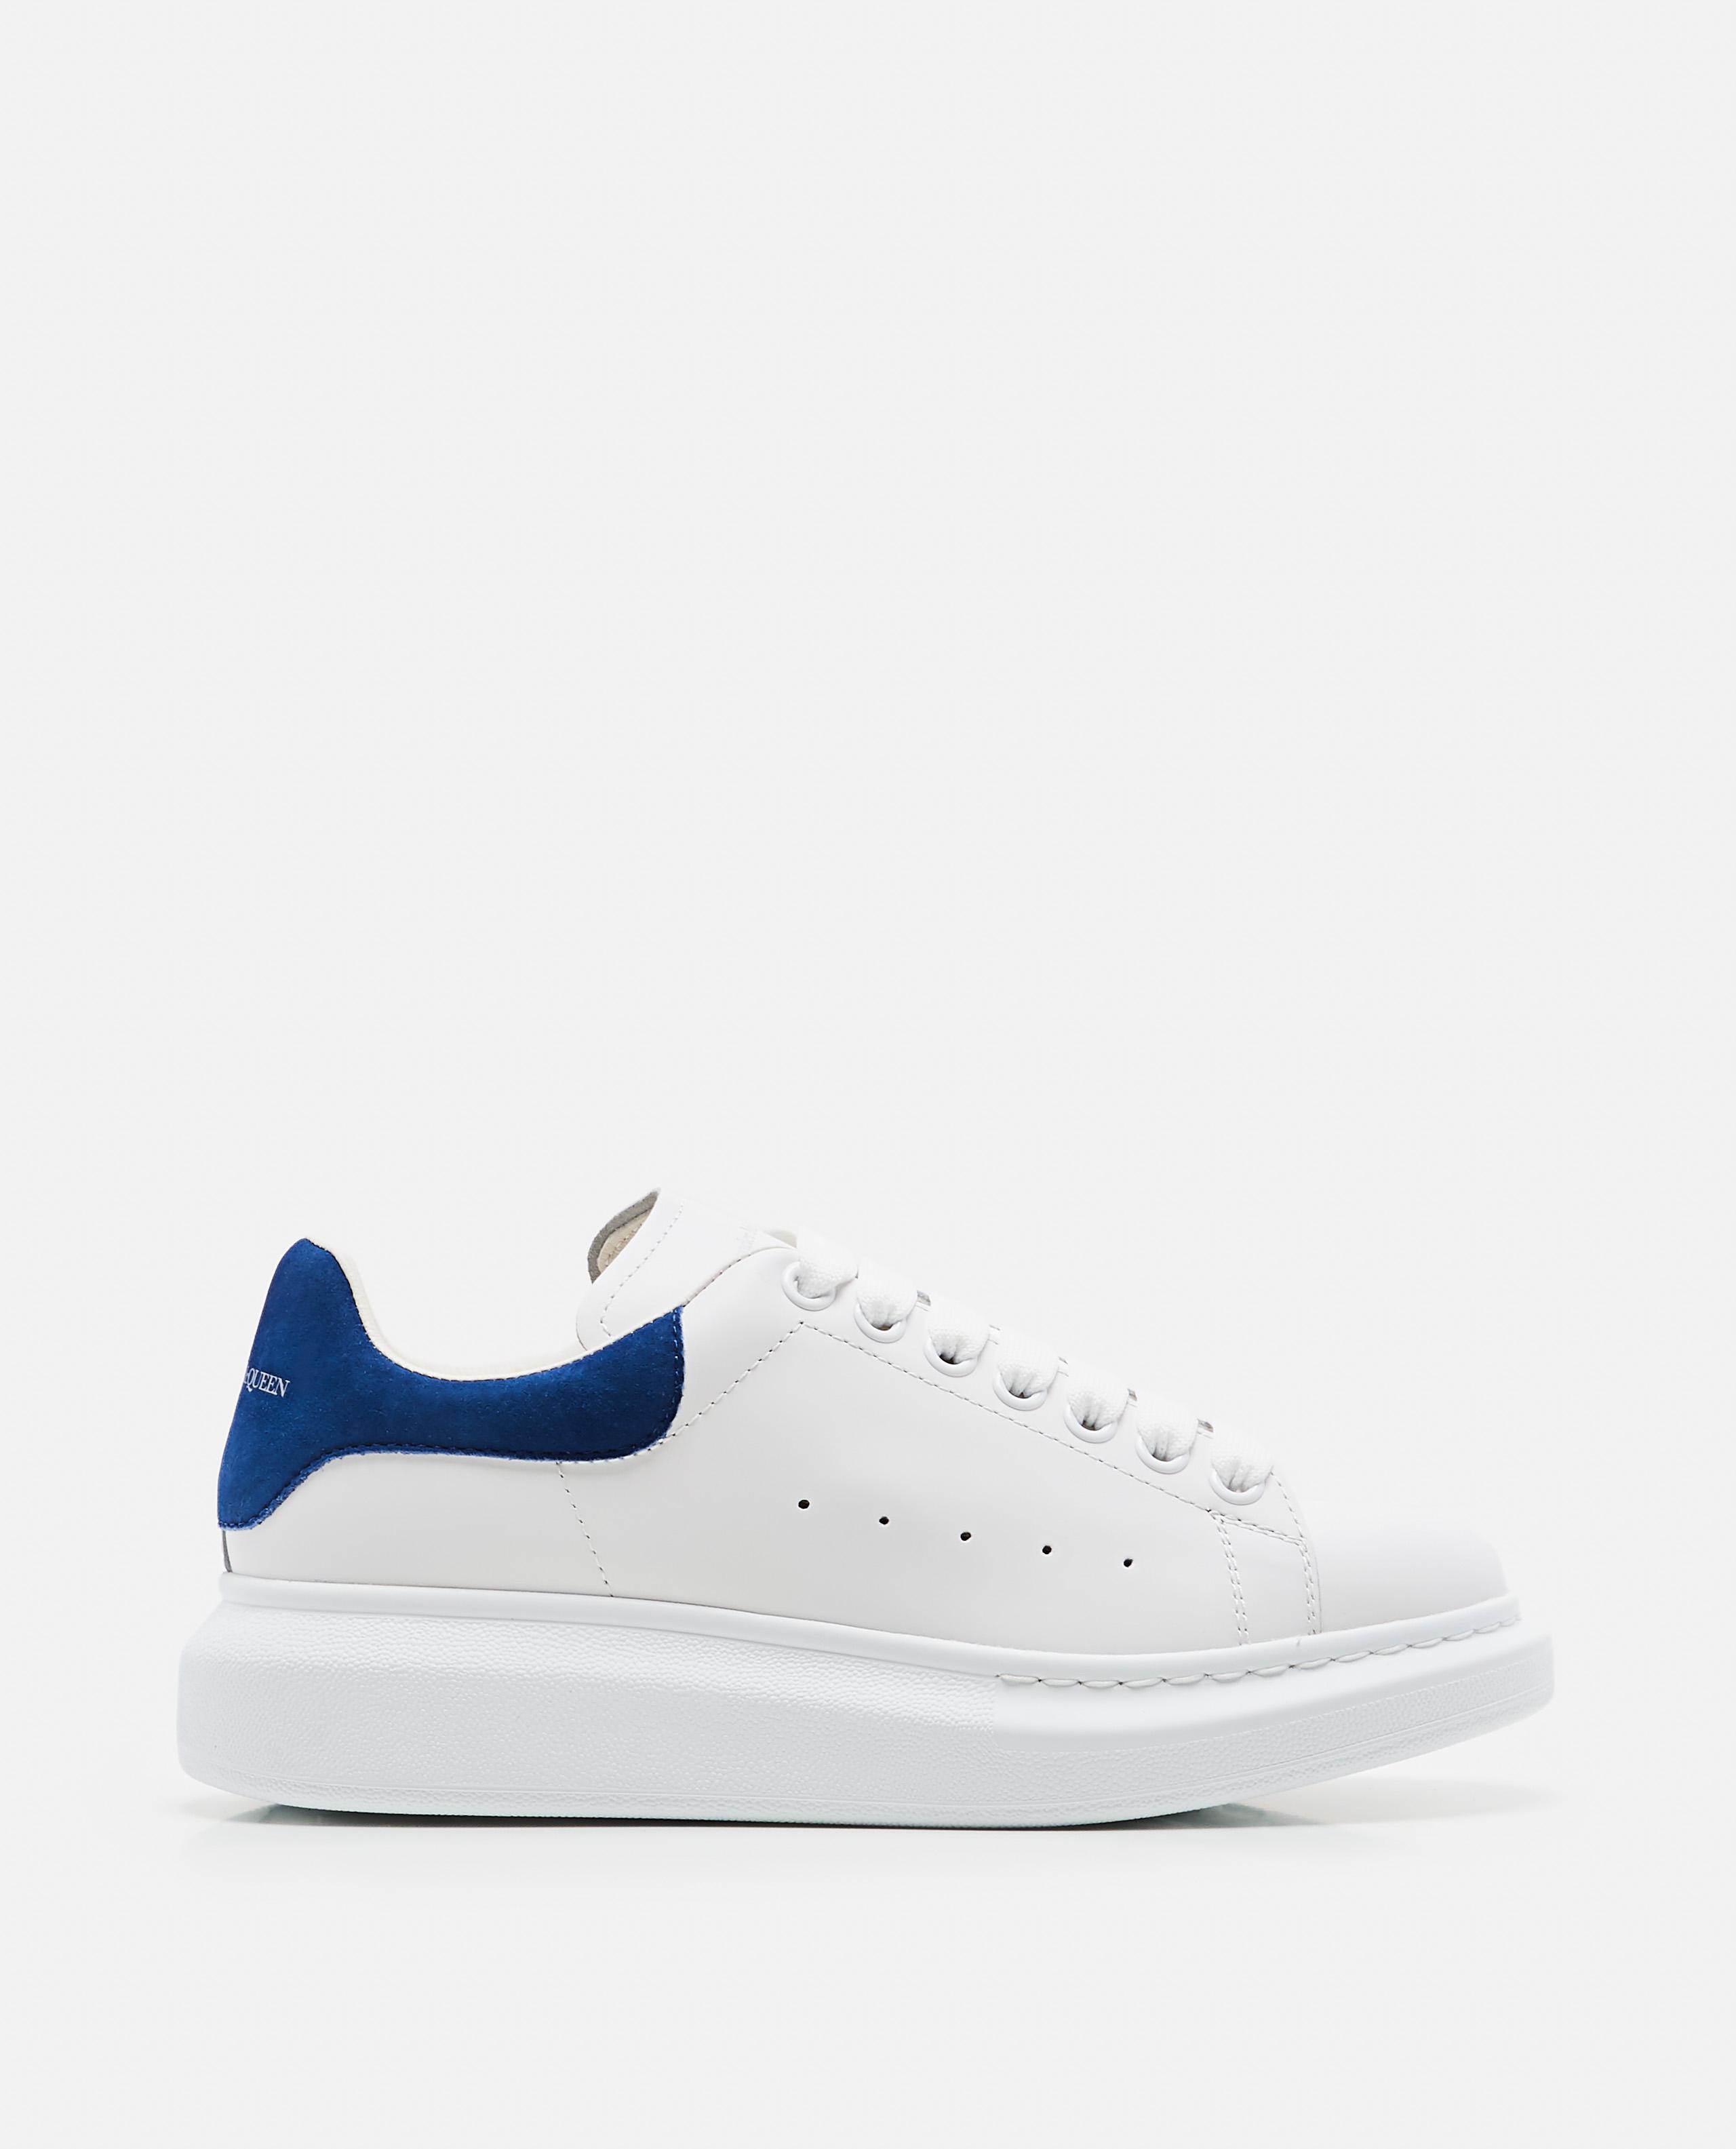 Oversized sneakers